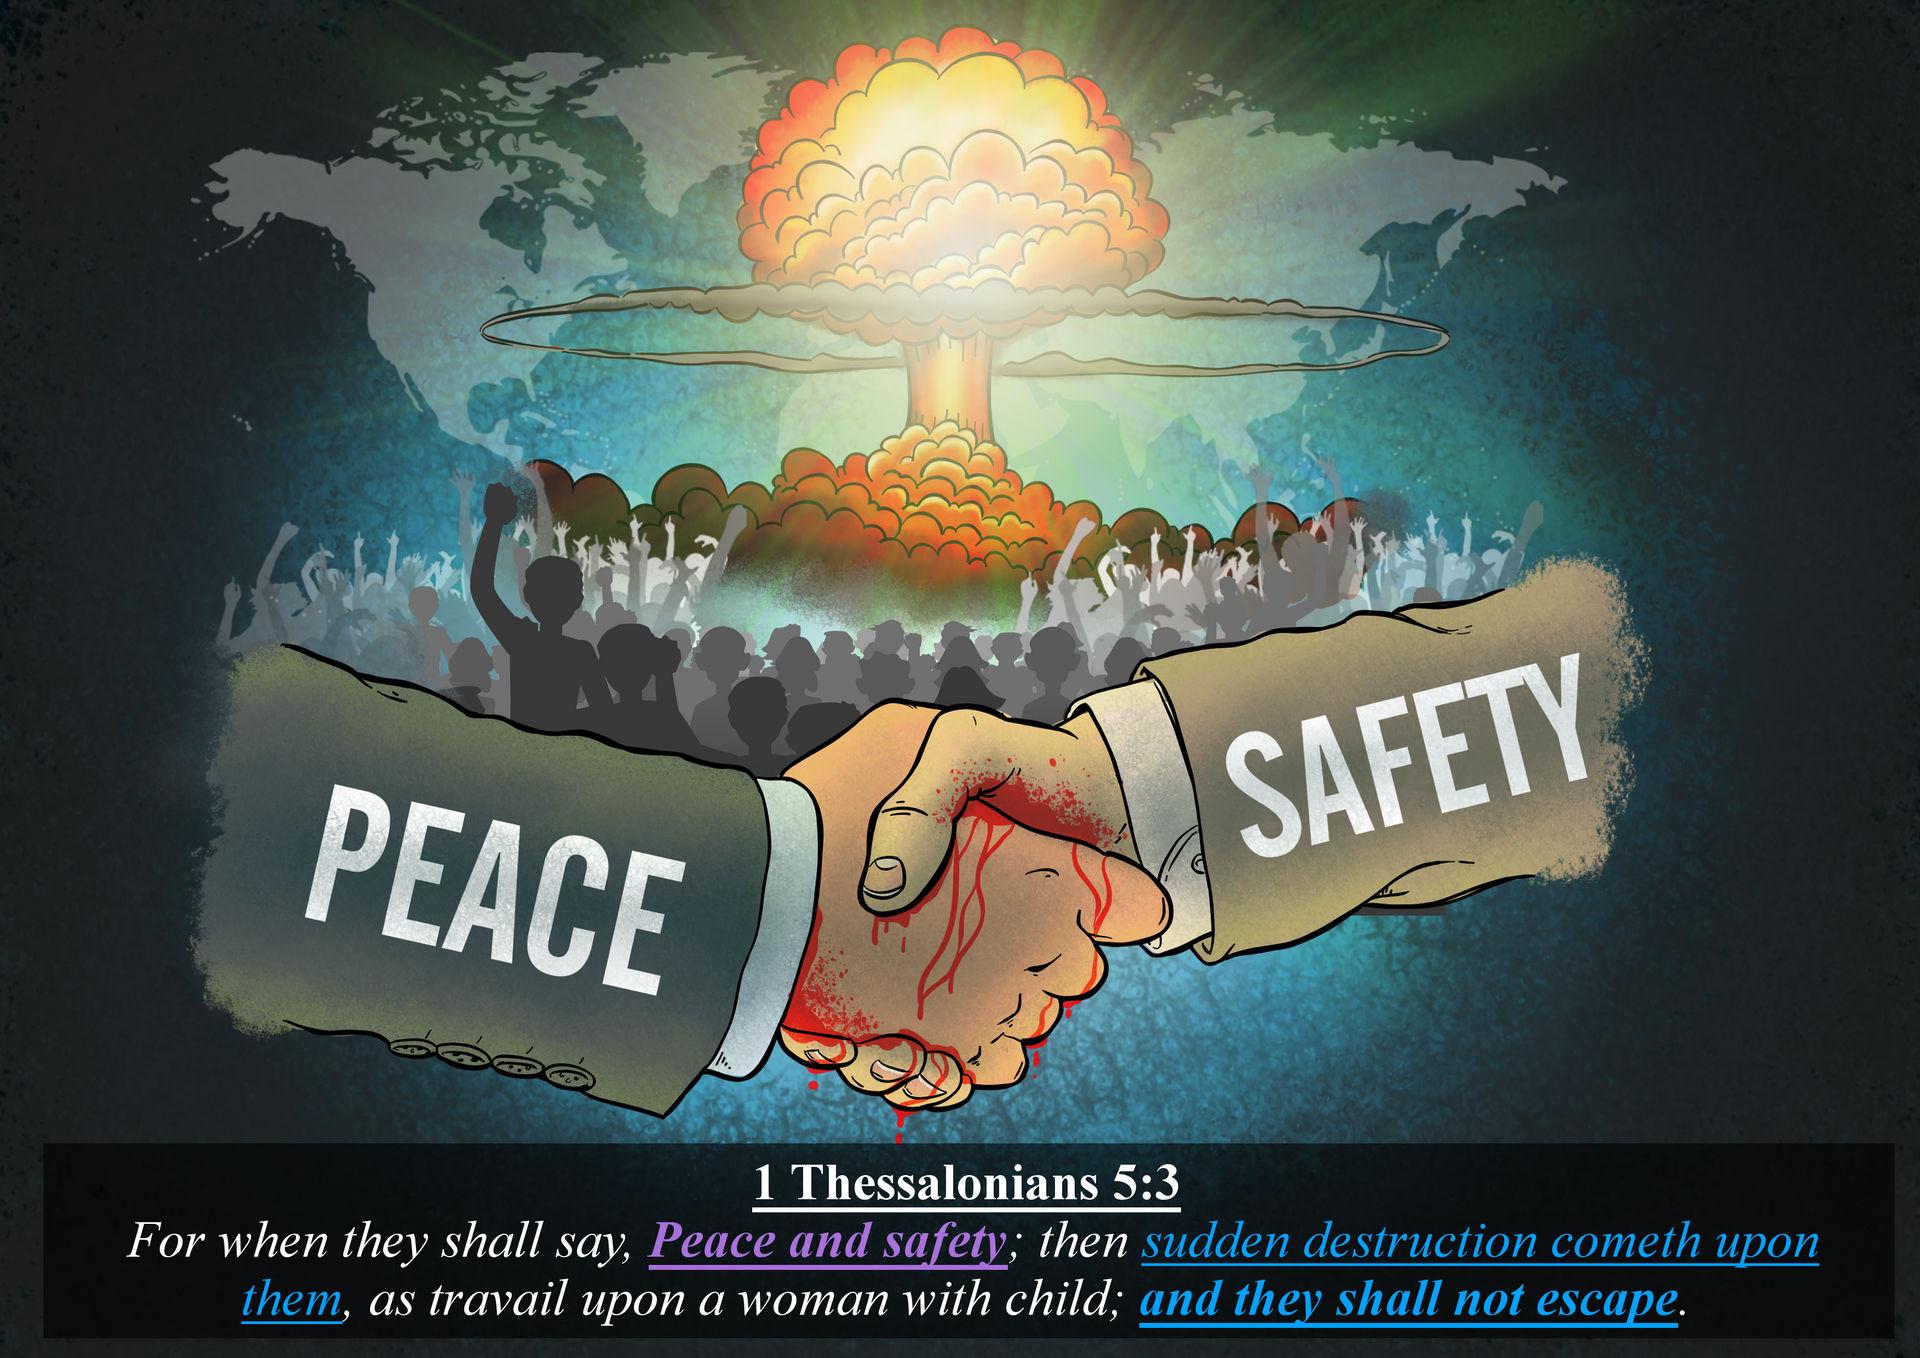 1 thessalonians 5:3 by alexpixels on DeviantArt